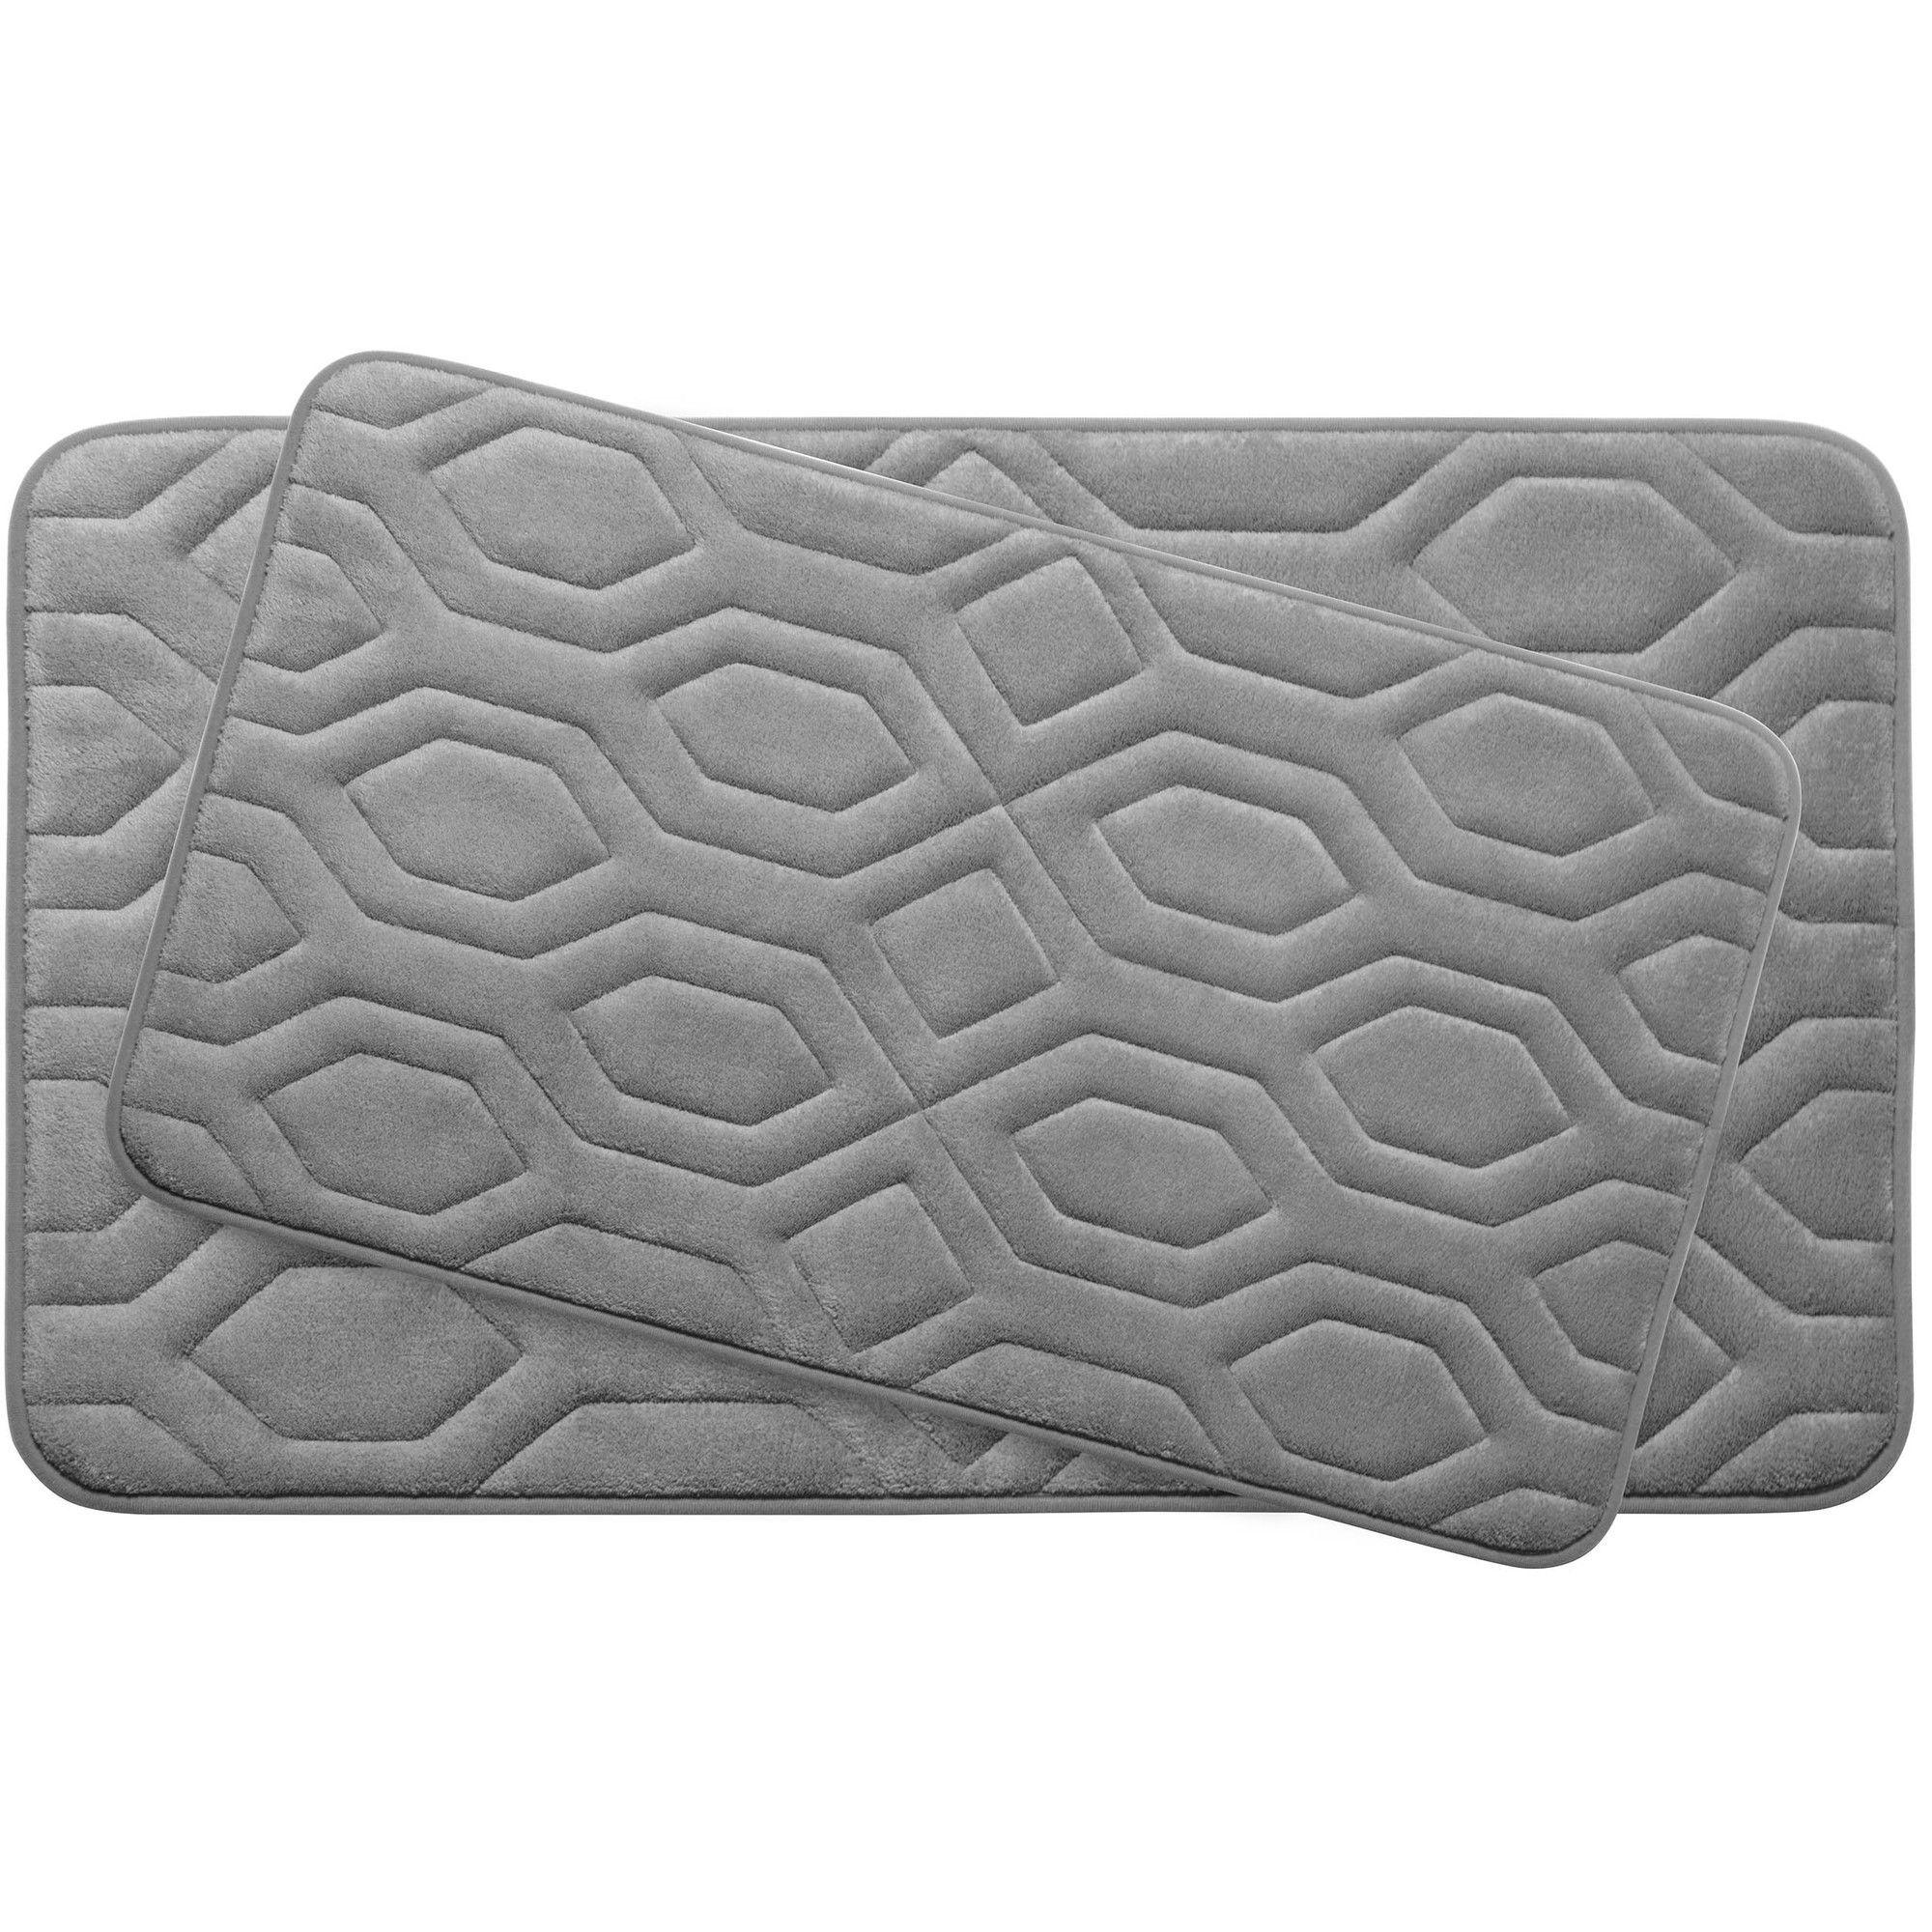 Turtle Shell Large 2 Piece Premium Micro Plush Memory Foam Bath Mat Set